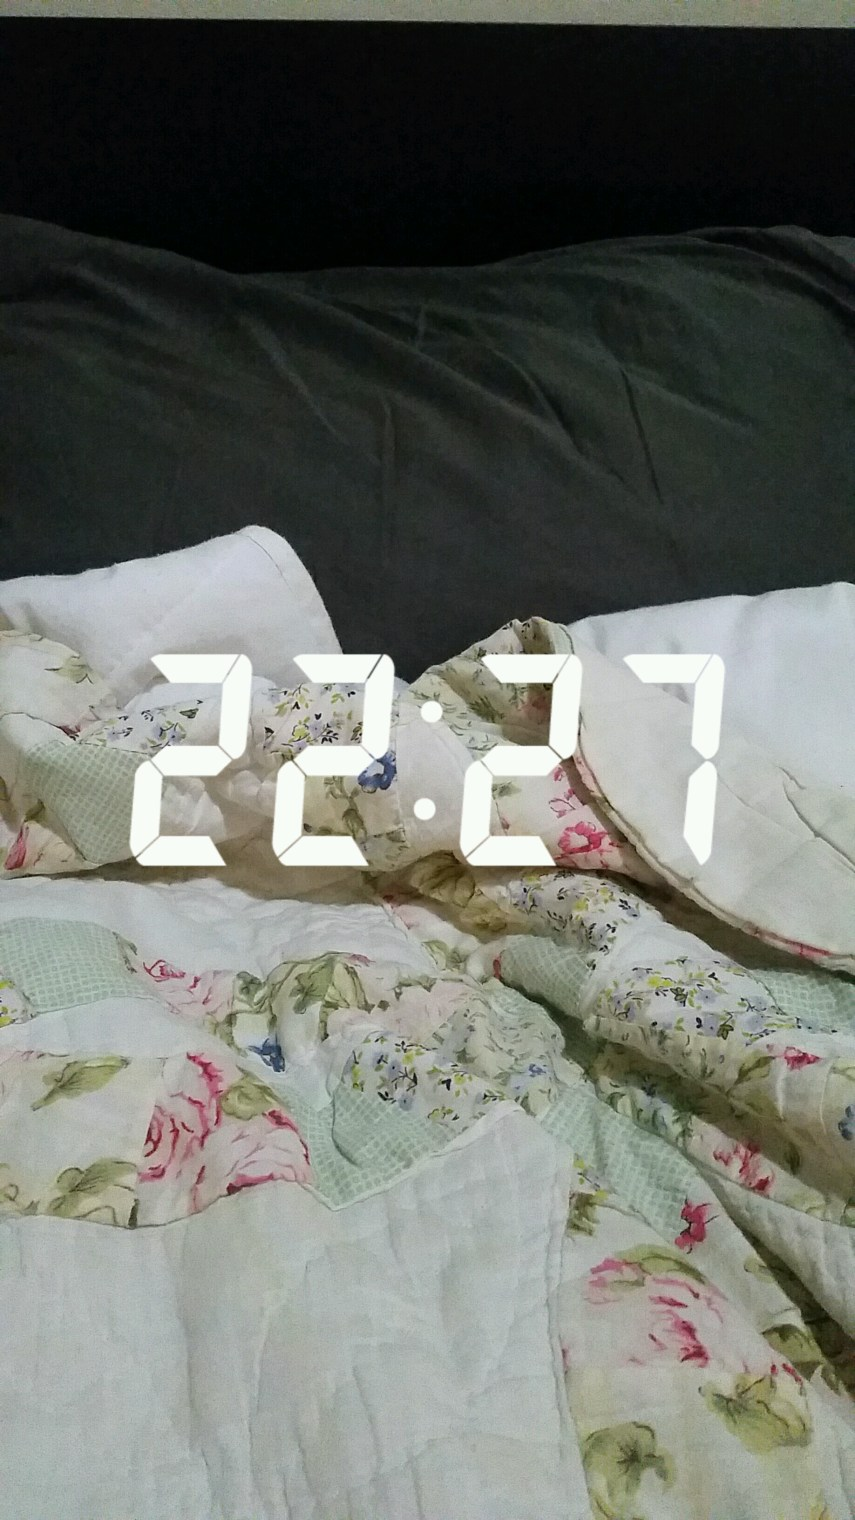 22.27